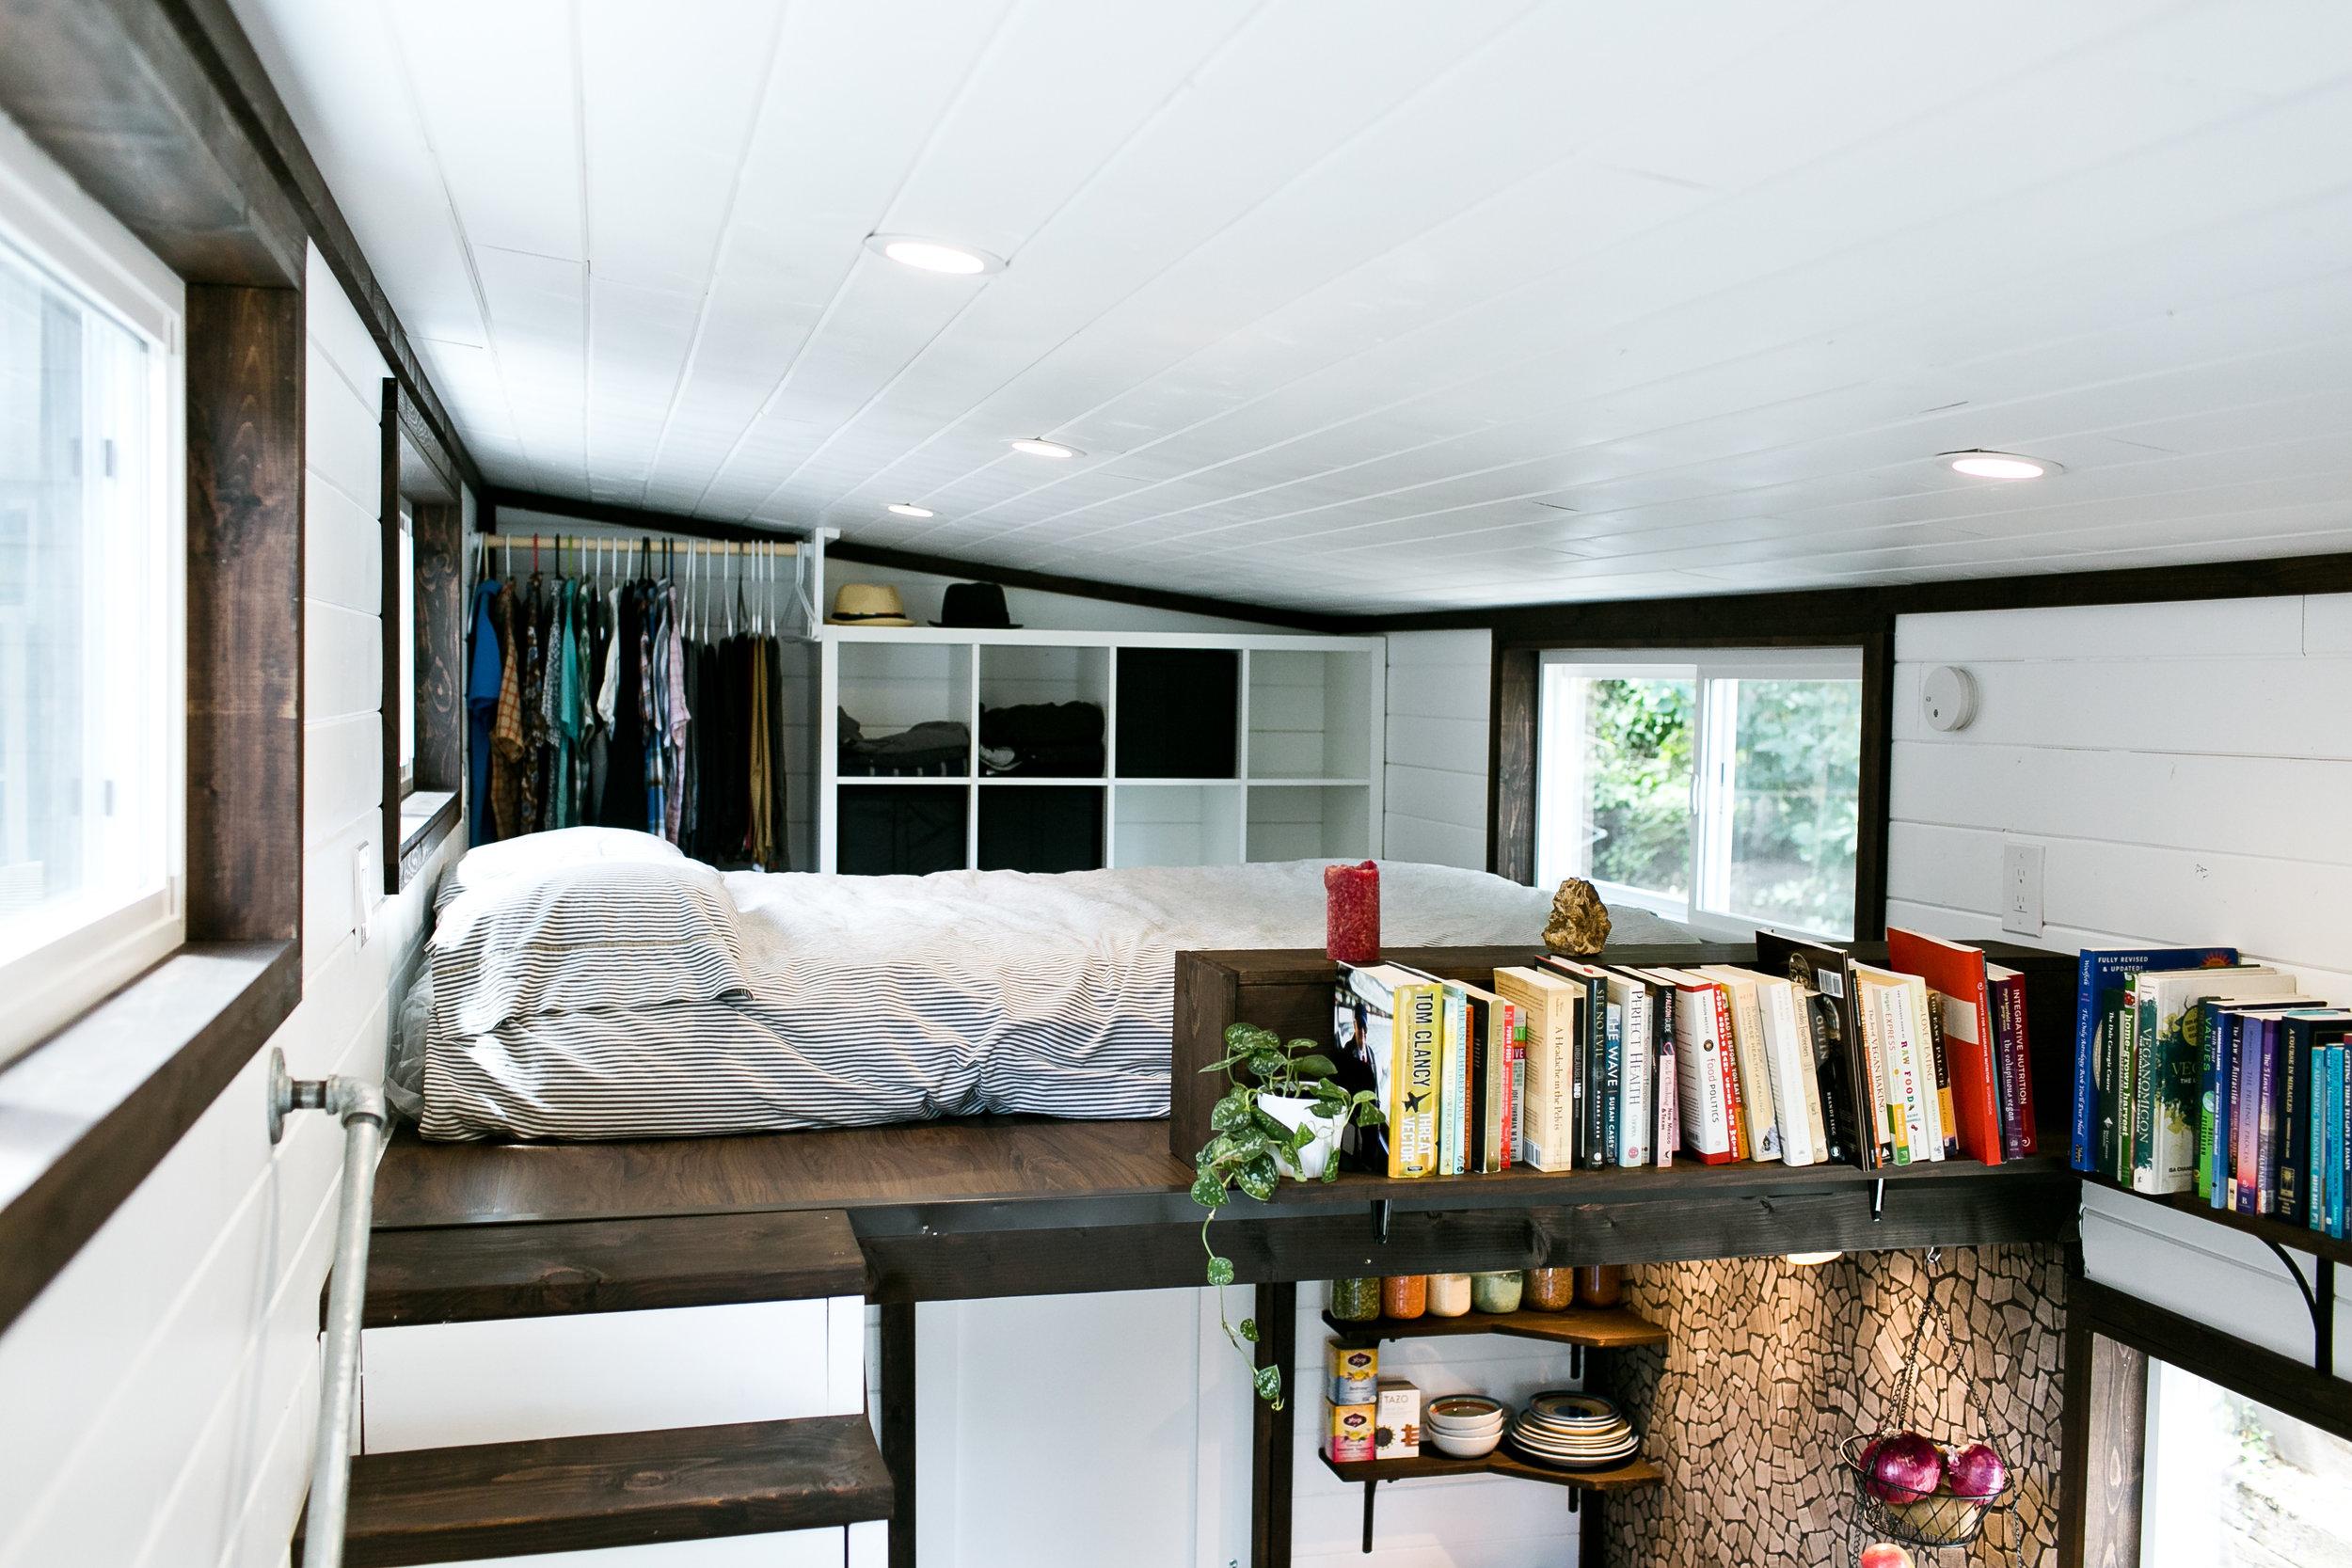 11' deep bedroom loft with 4' of head space